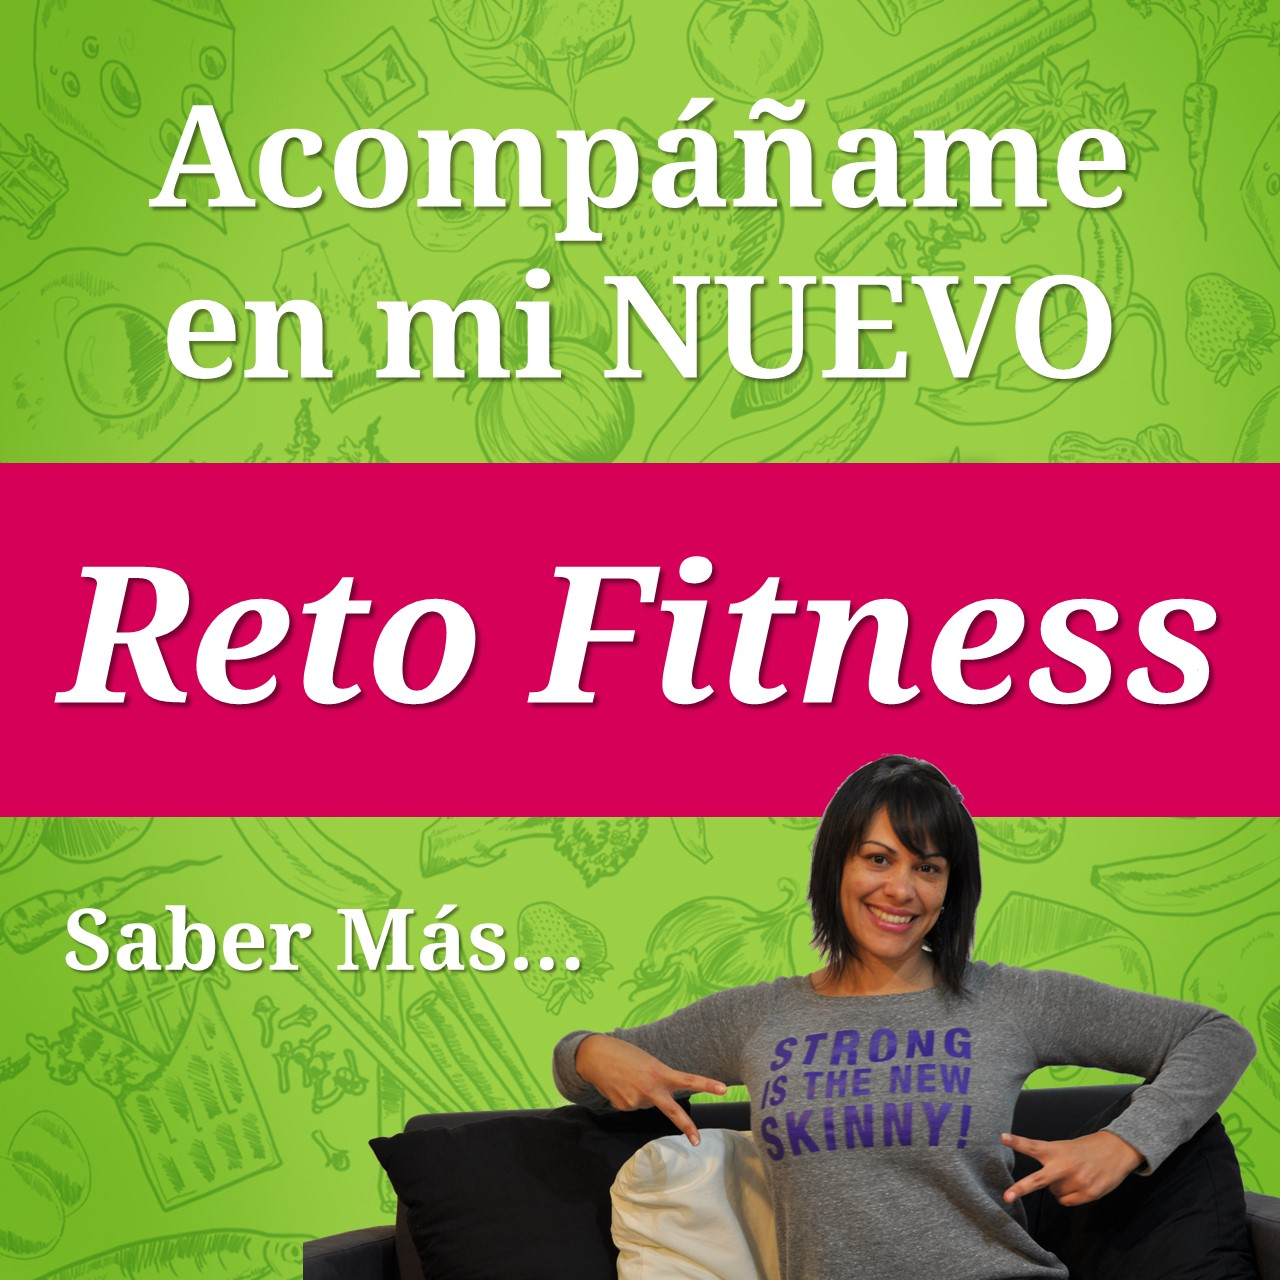 Reto Fitness MND 2015